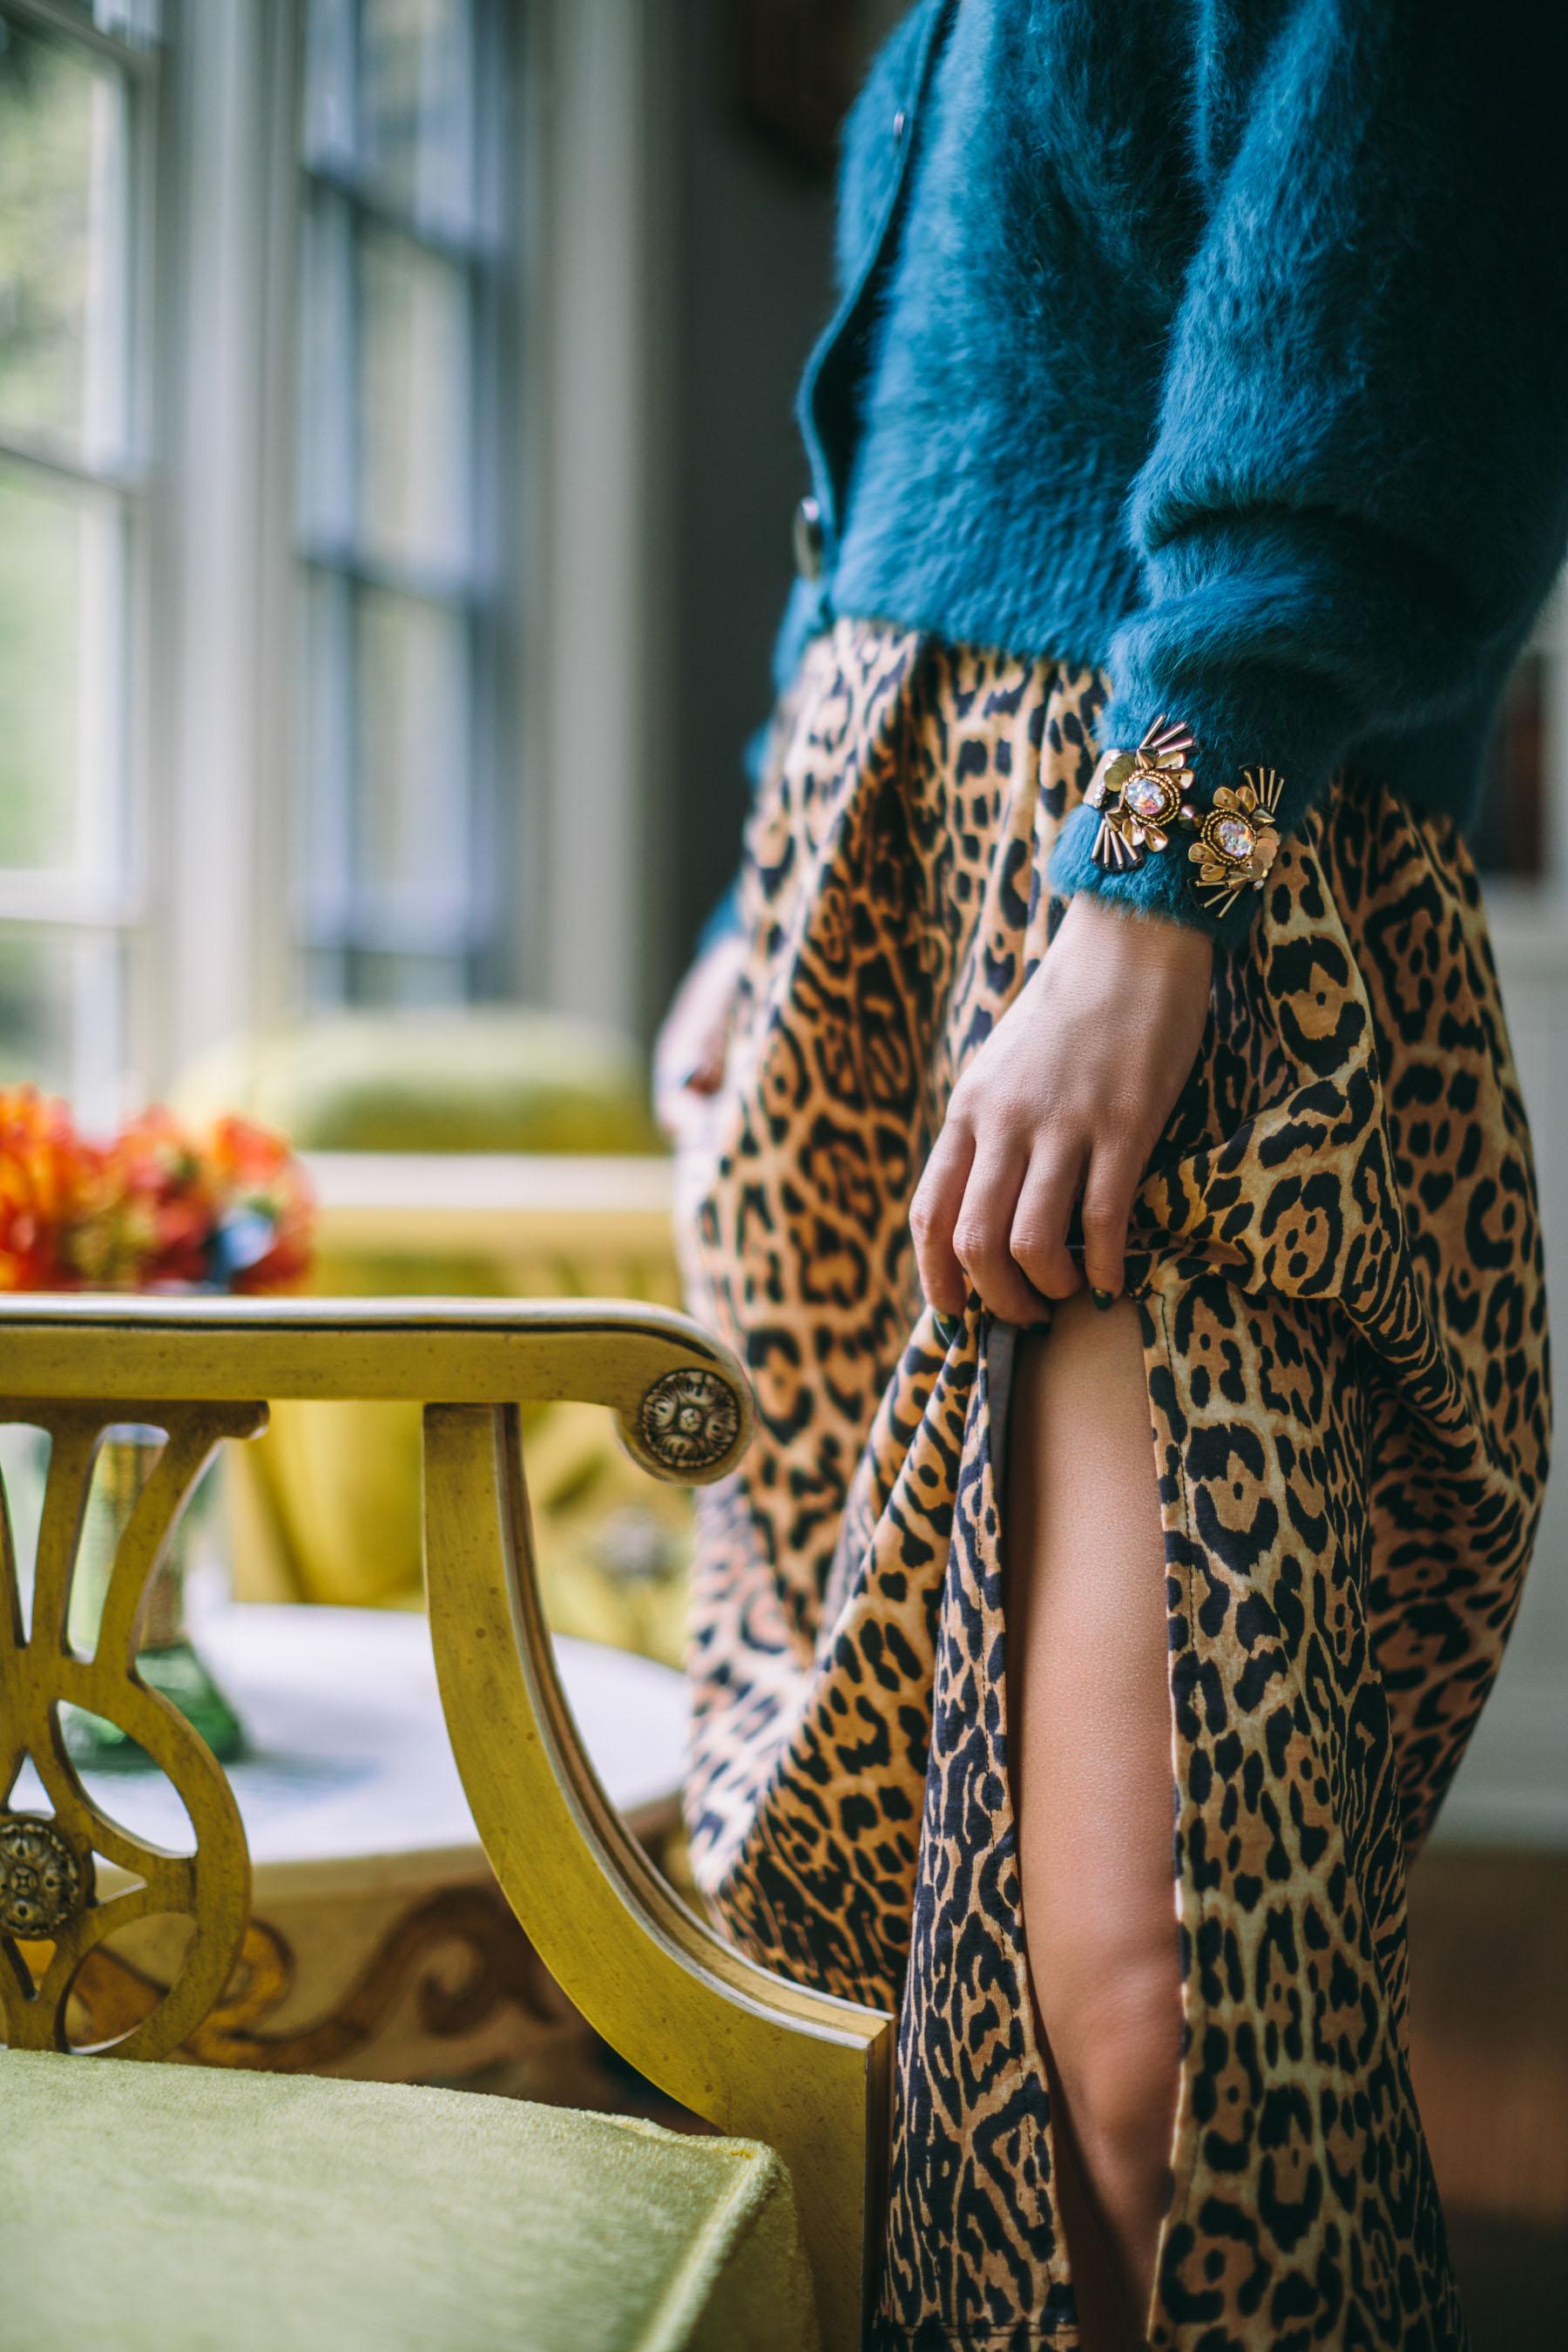 animal print, leopard slip dress, leopard dress and colored cardigan, Mignonne Gavigan jewelry // Notjessfashion.com